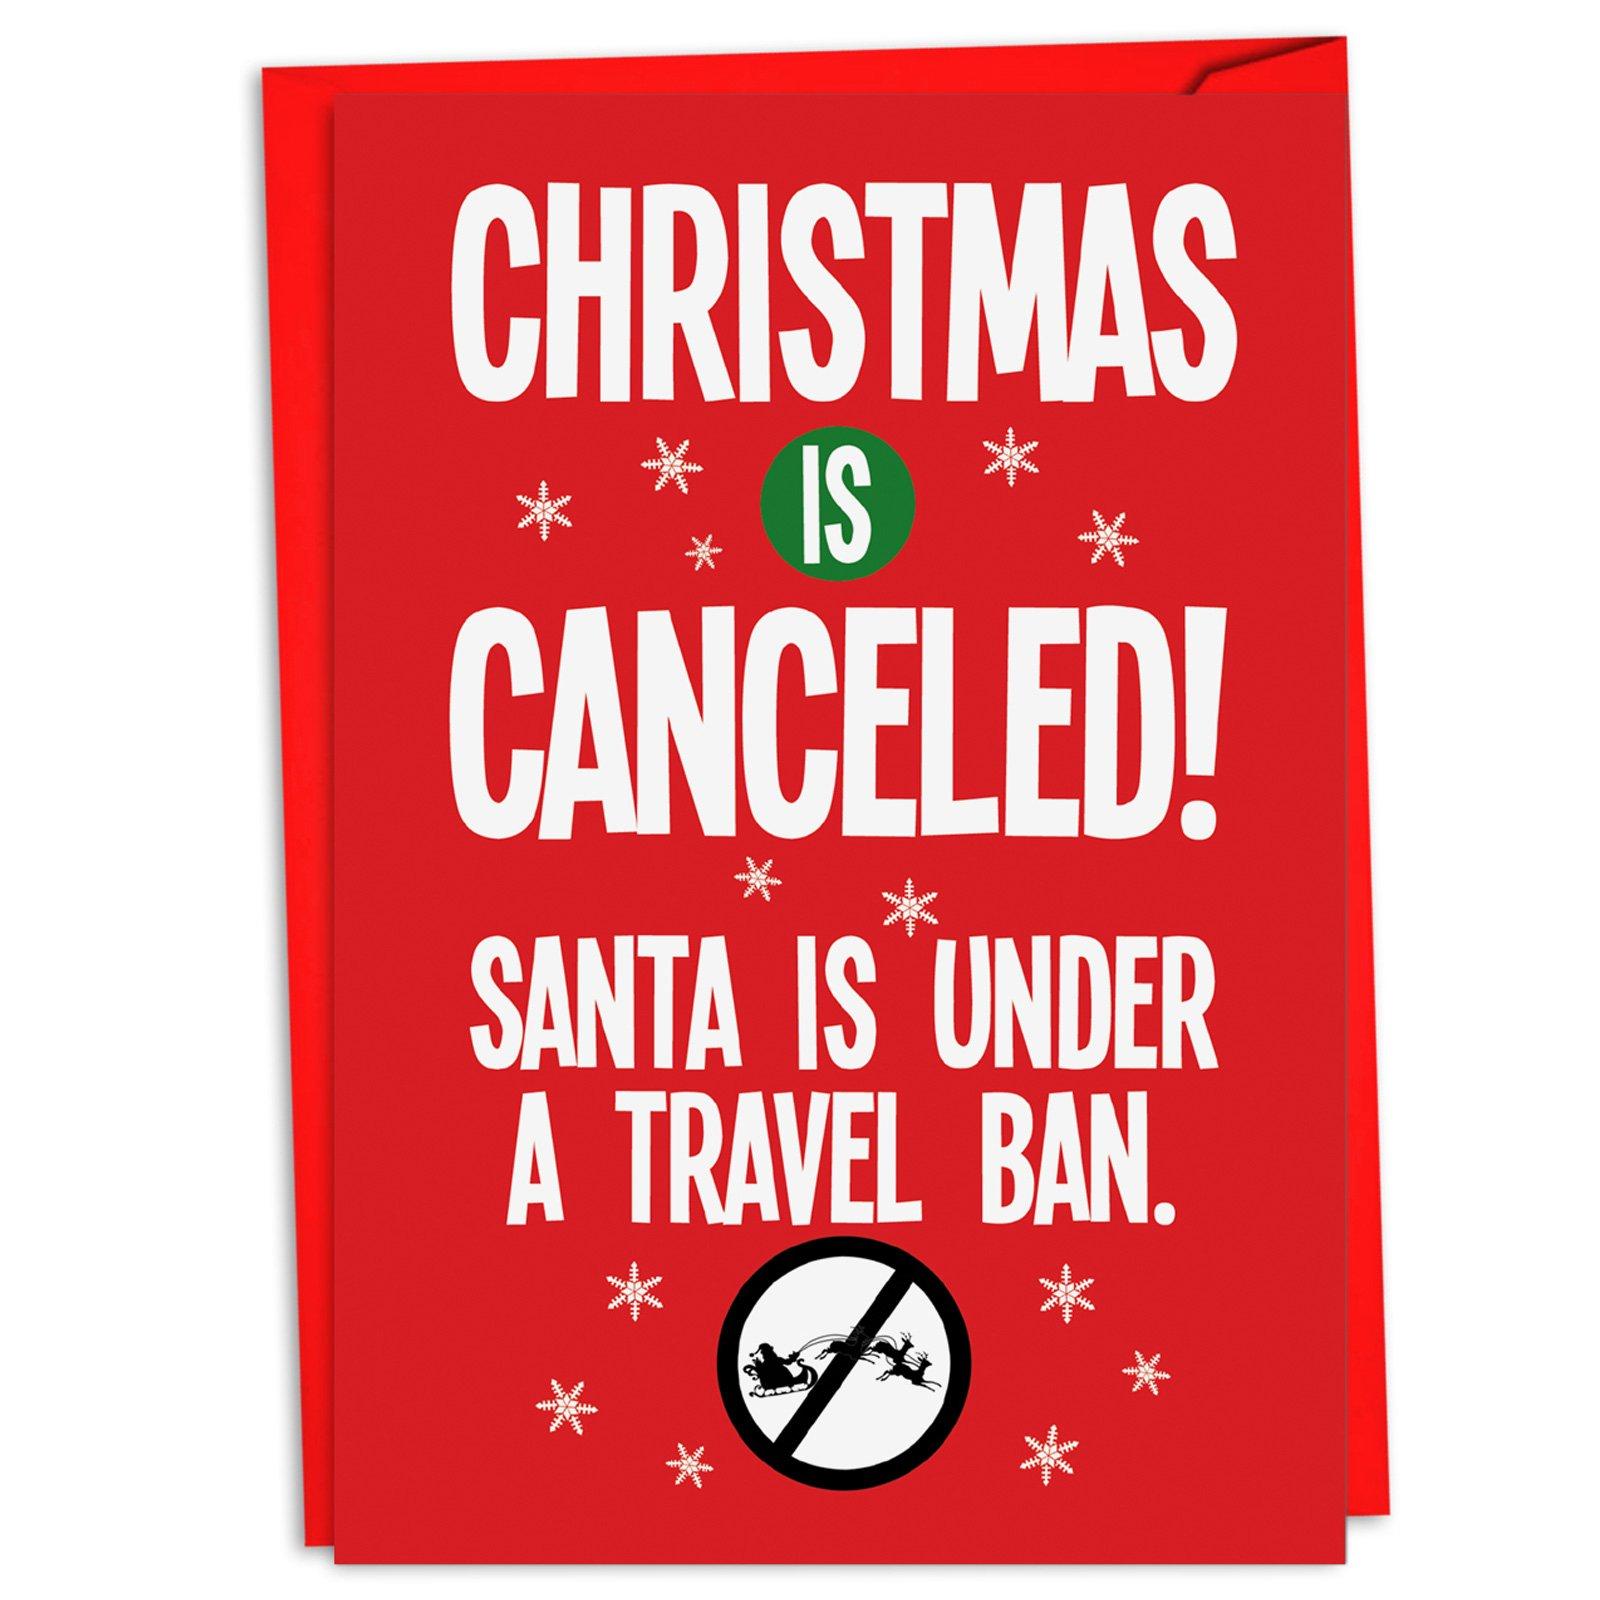 C4280XSG-B12 Box Set of 12 Santa Travel Ban Merry Christmas Greeting Cards; with Envelopes